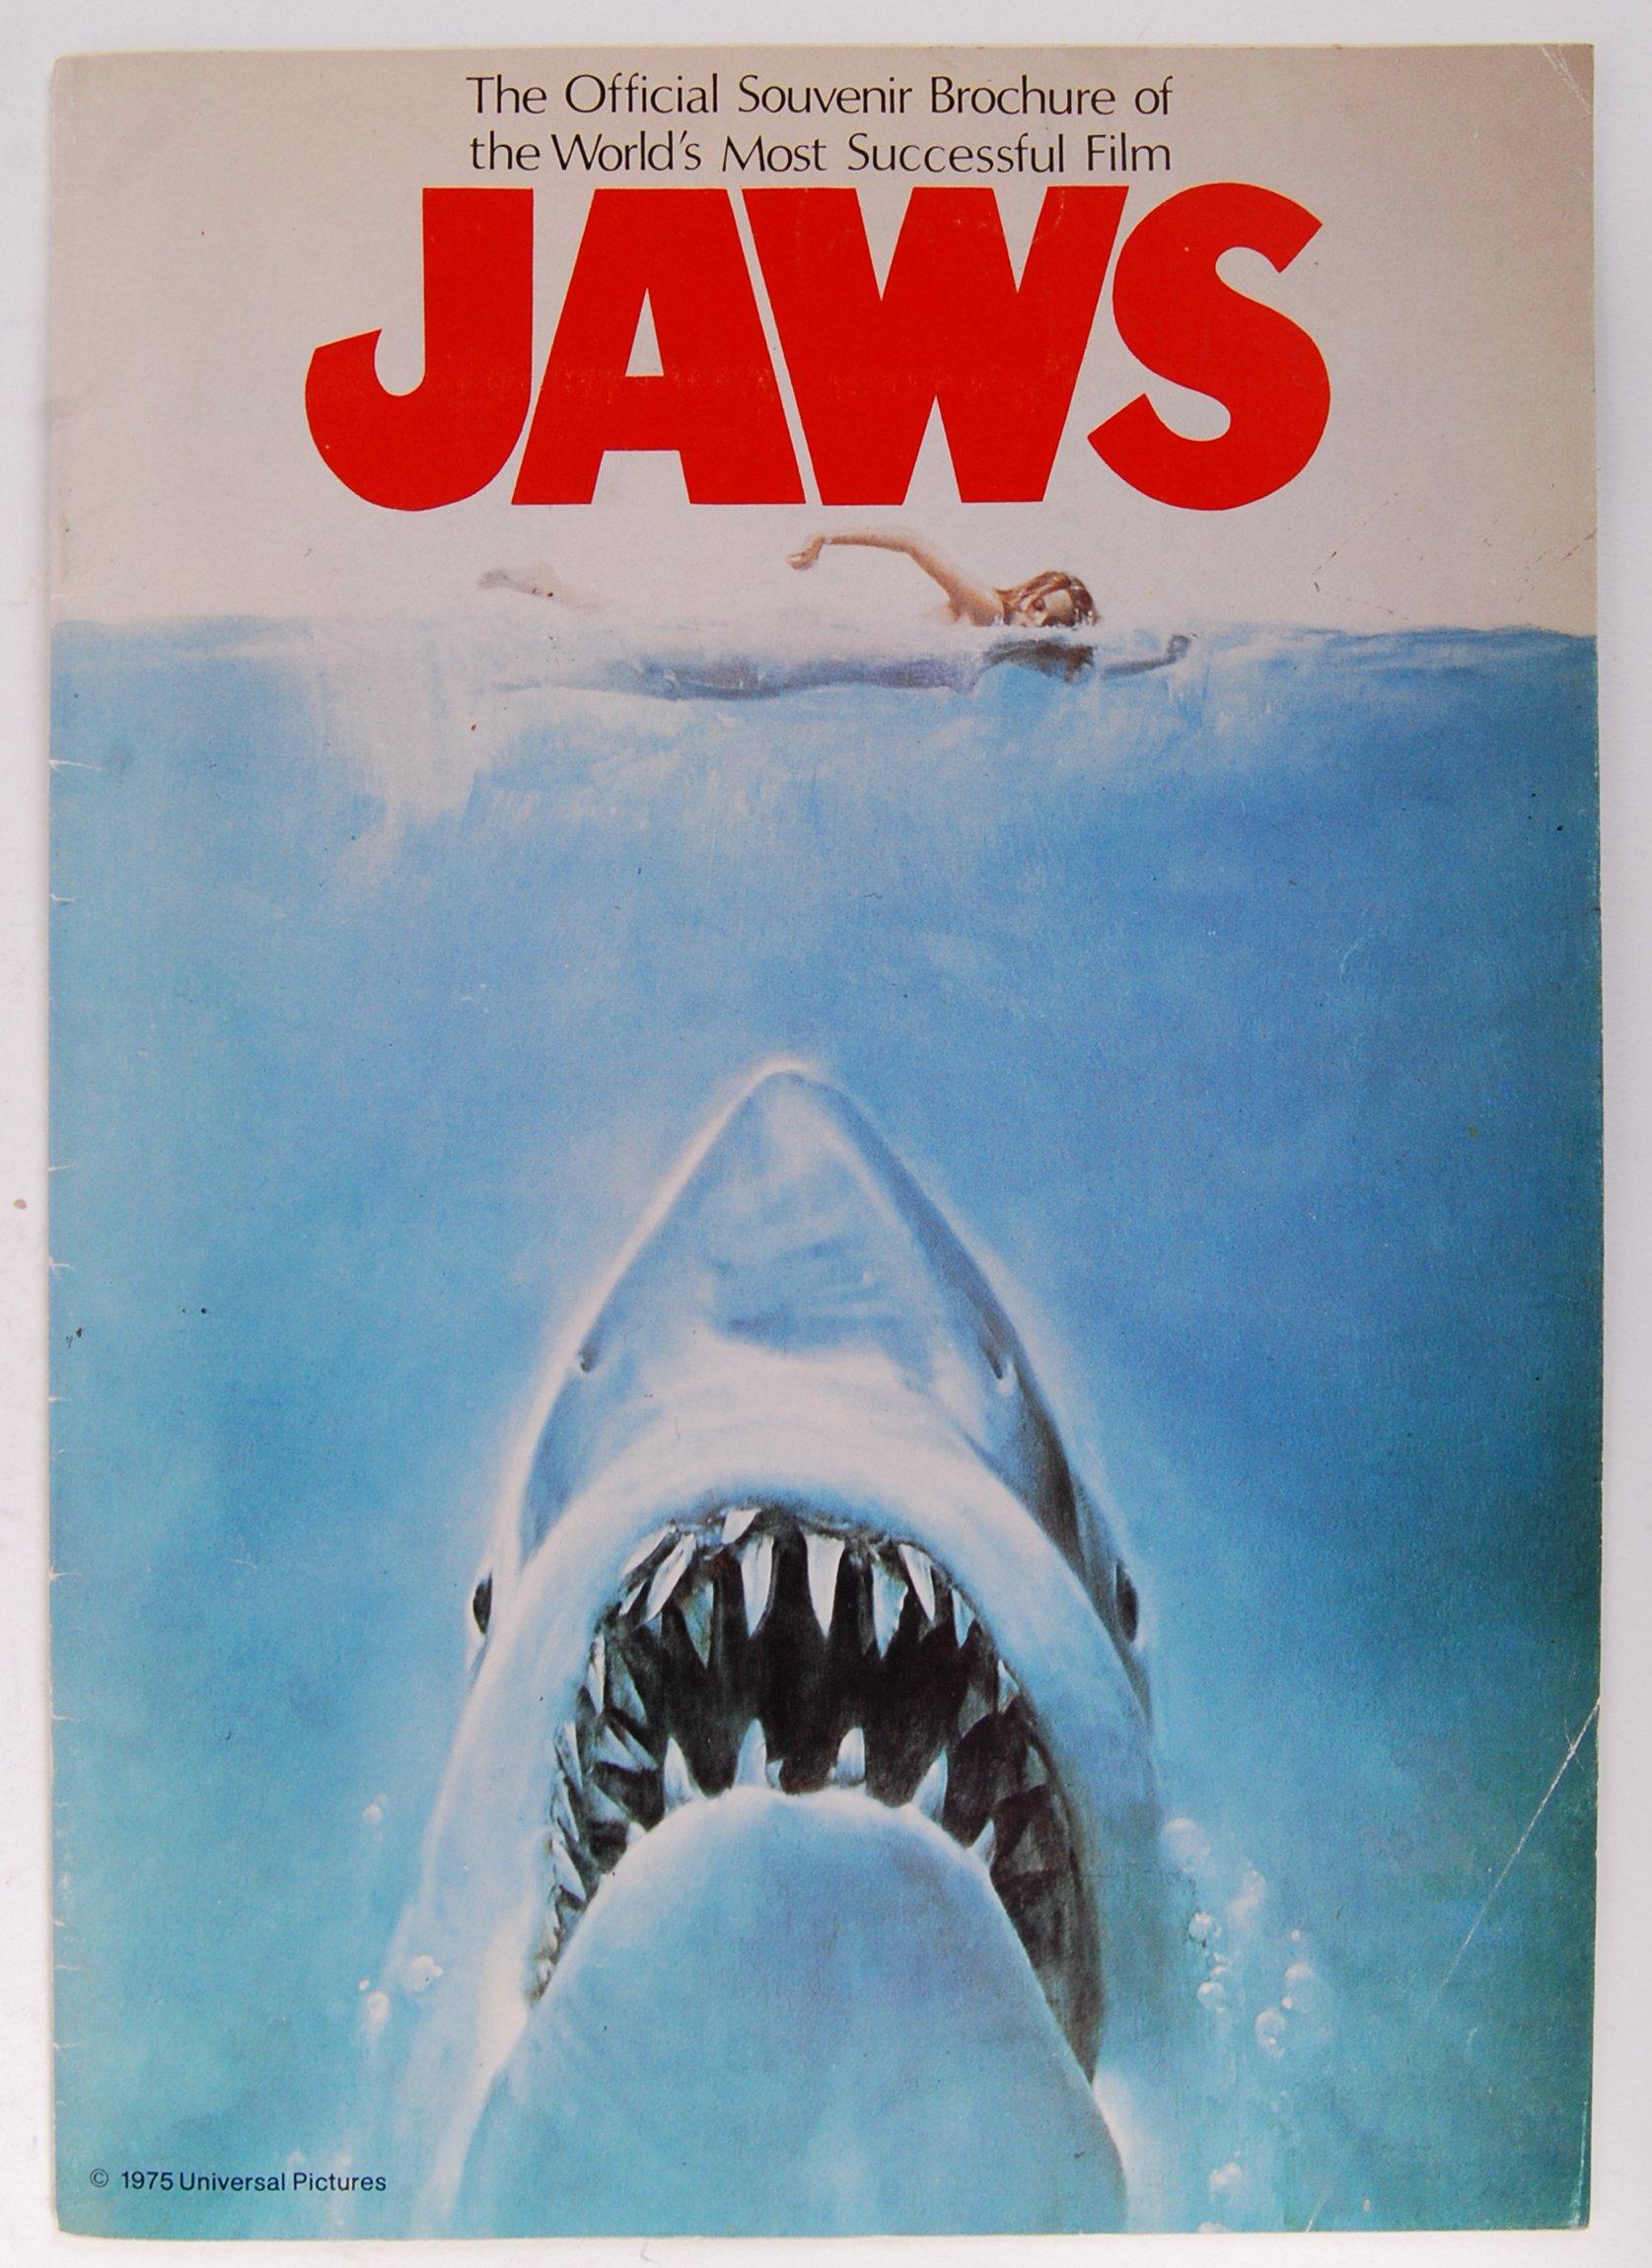 Lot 13 - JAWS - OFFICIAL SOUVENIR BROCHURE - CINEMA ADVERTISING EPHEMERA